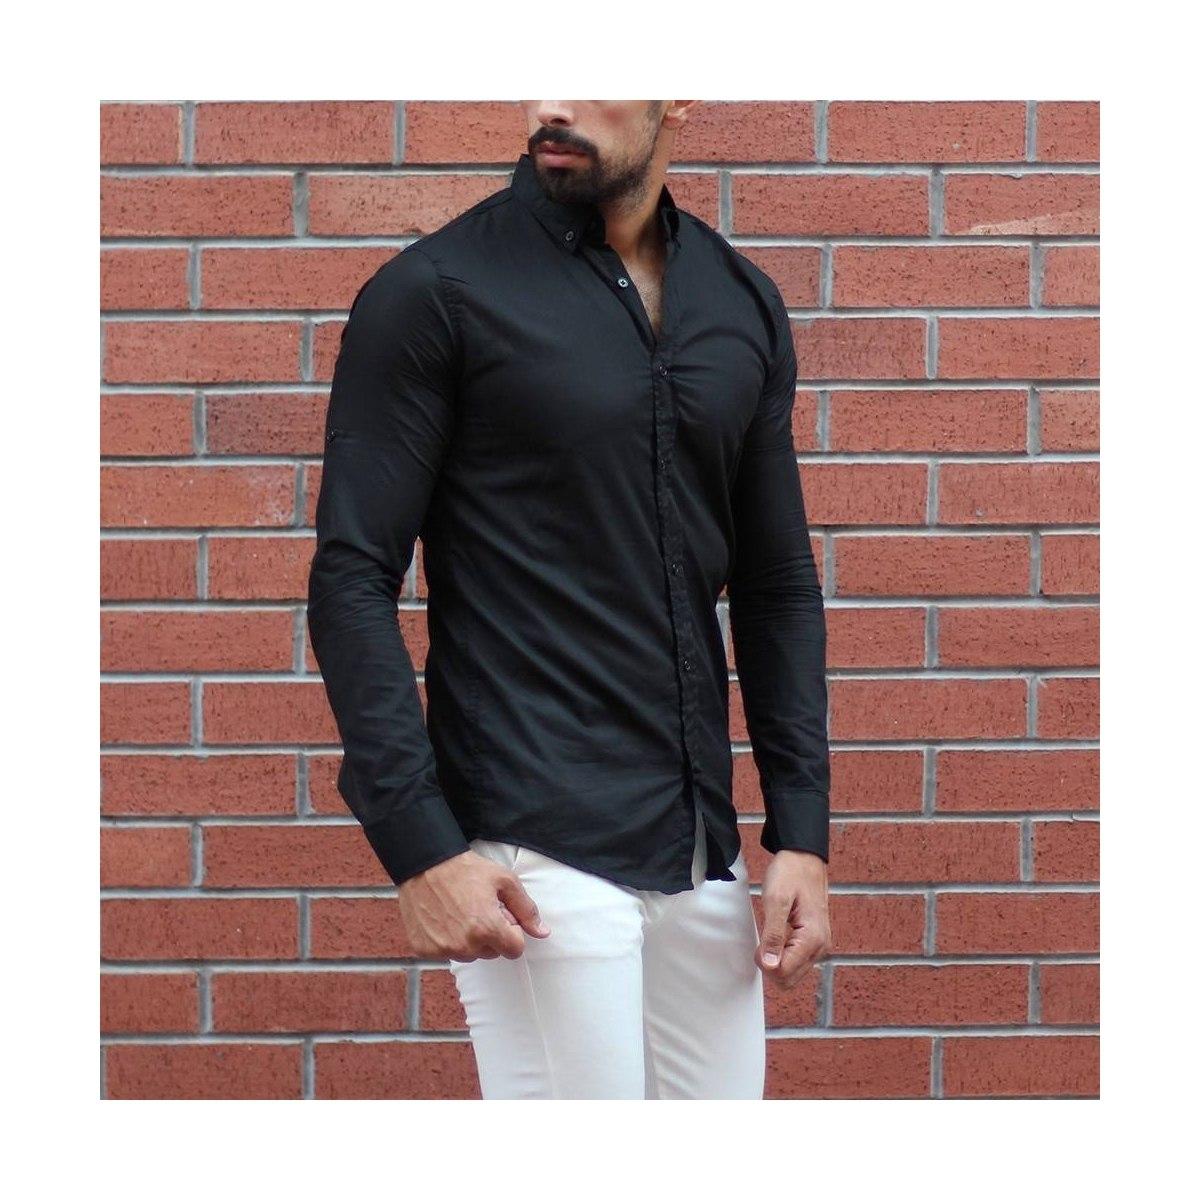 Men's Stylish Basic Shirt In Black MV Shirt Collection - 1